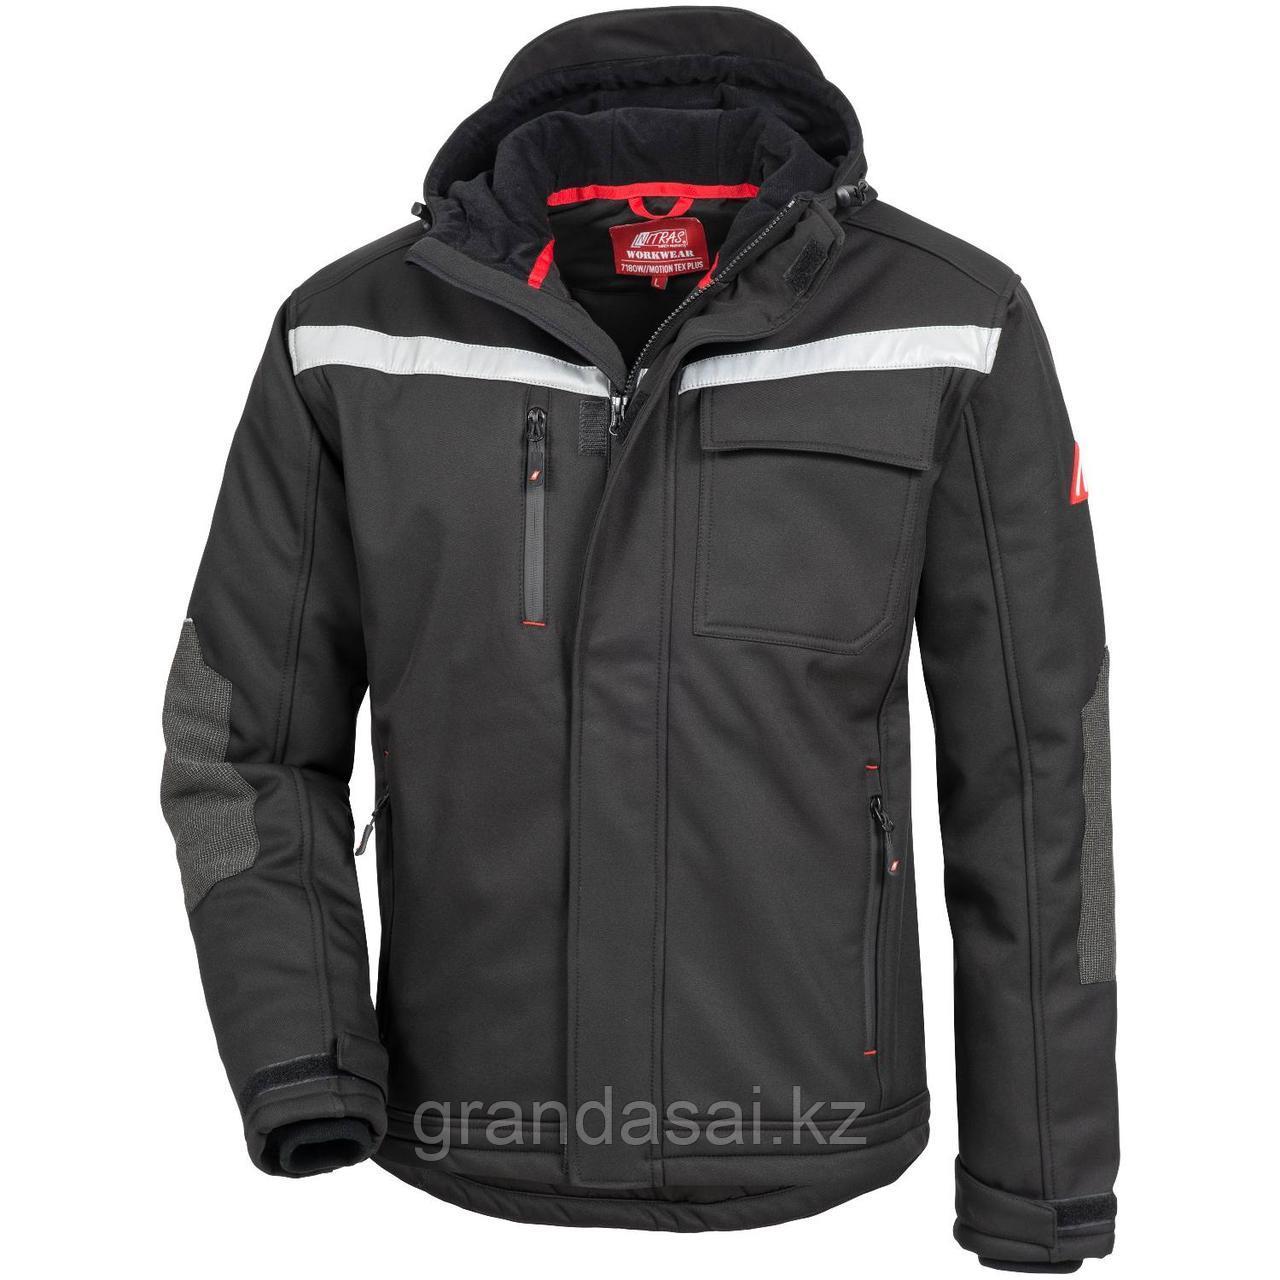 Рабочая зимняя куртка NITRAS 7180W MOTION TEX PLUS